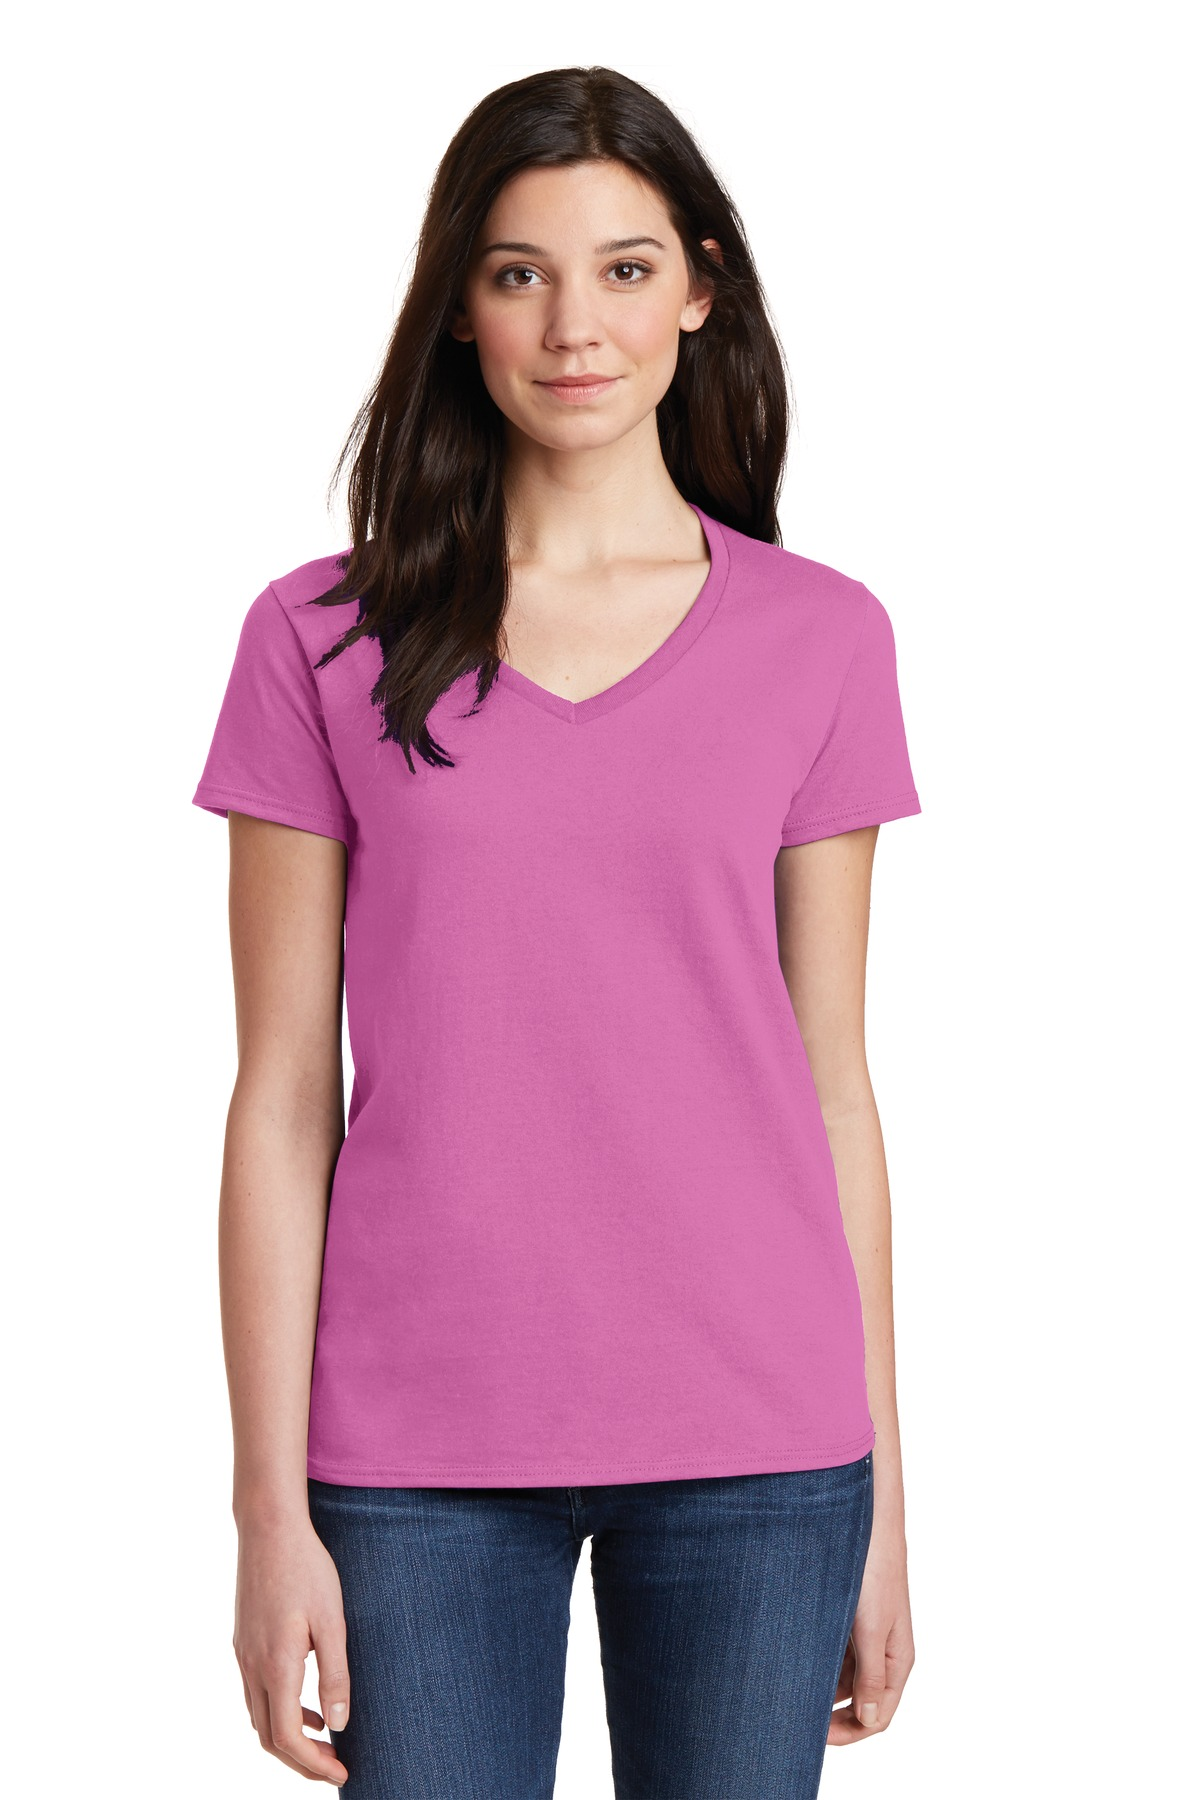 Gildan  5V00L - Ladies Heavy Cotton 100% Cotton V-Neck T-Shirt